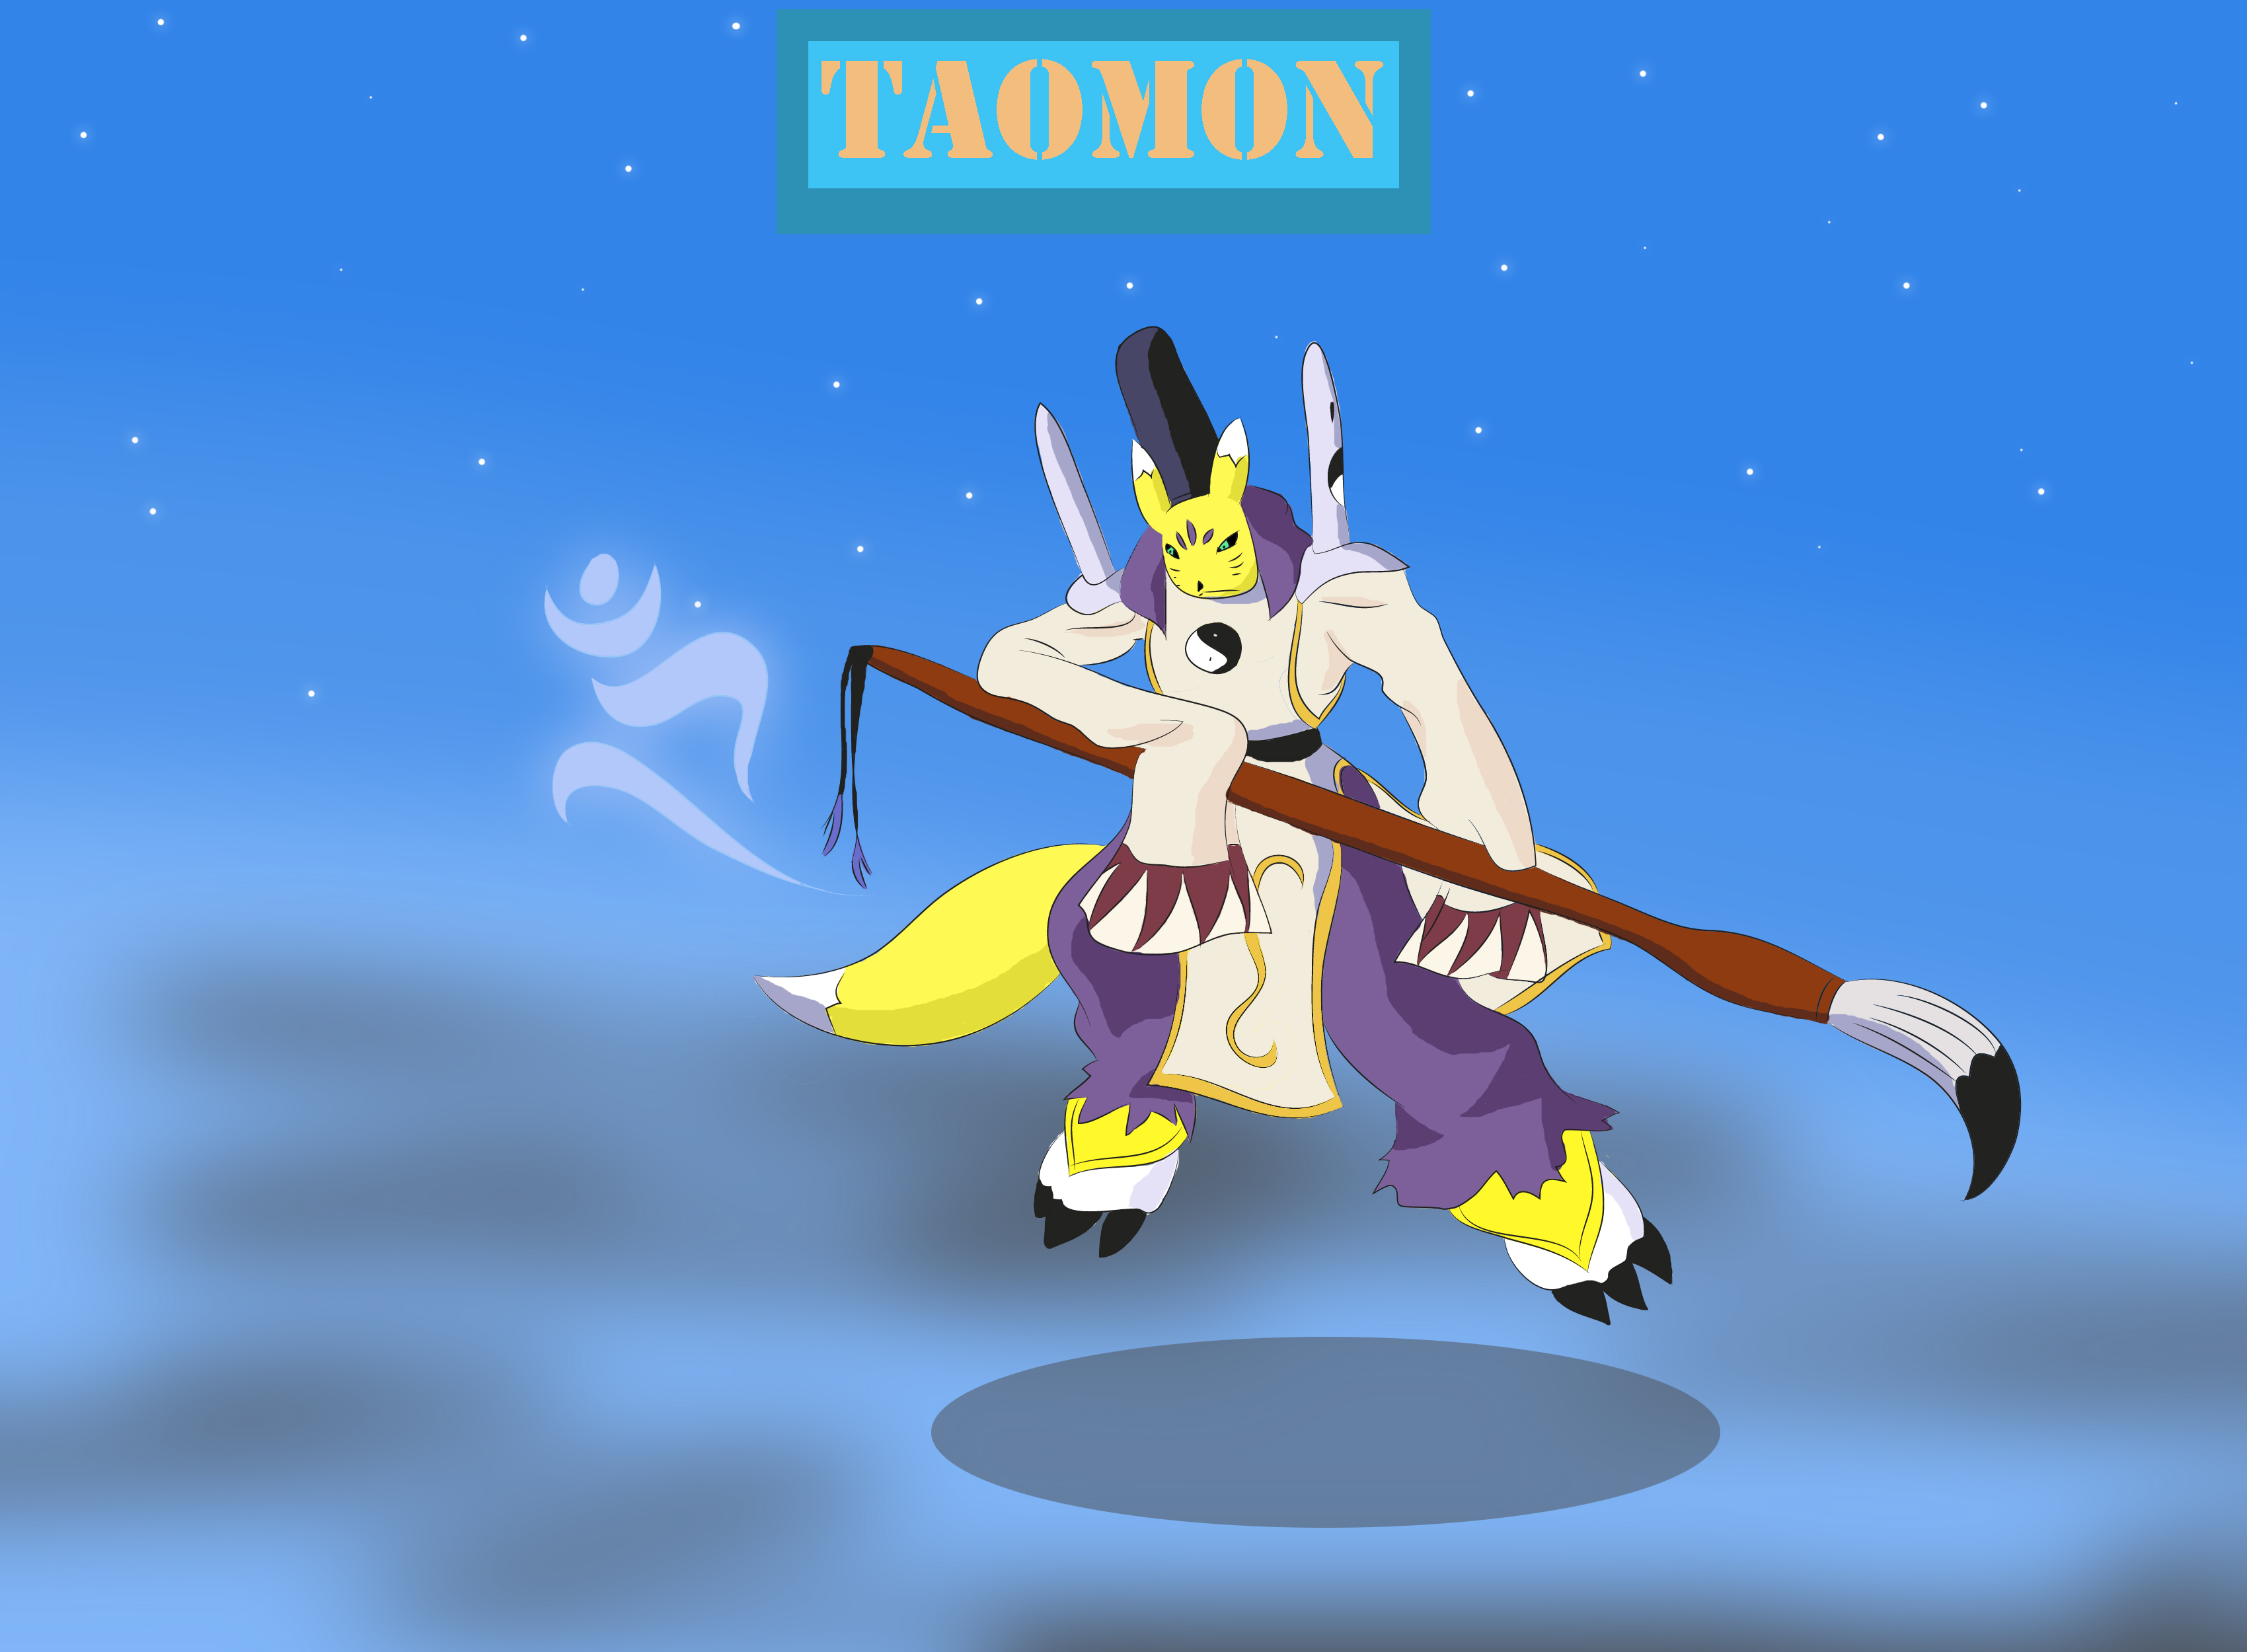 Taomon by Louisetheanimator